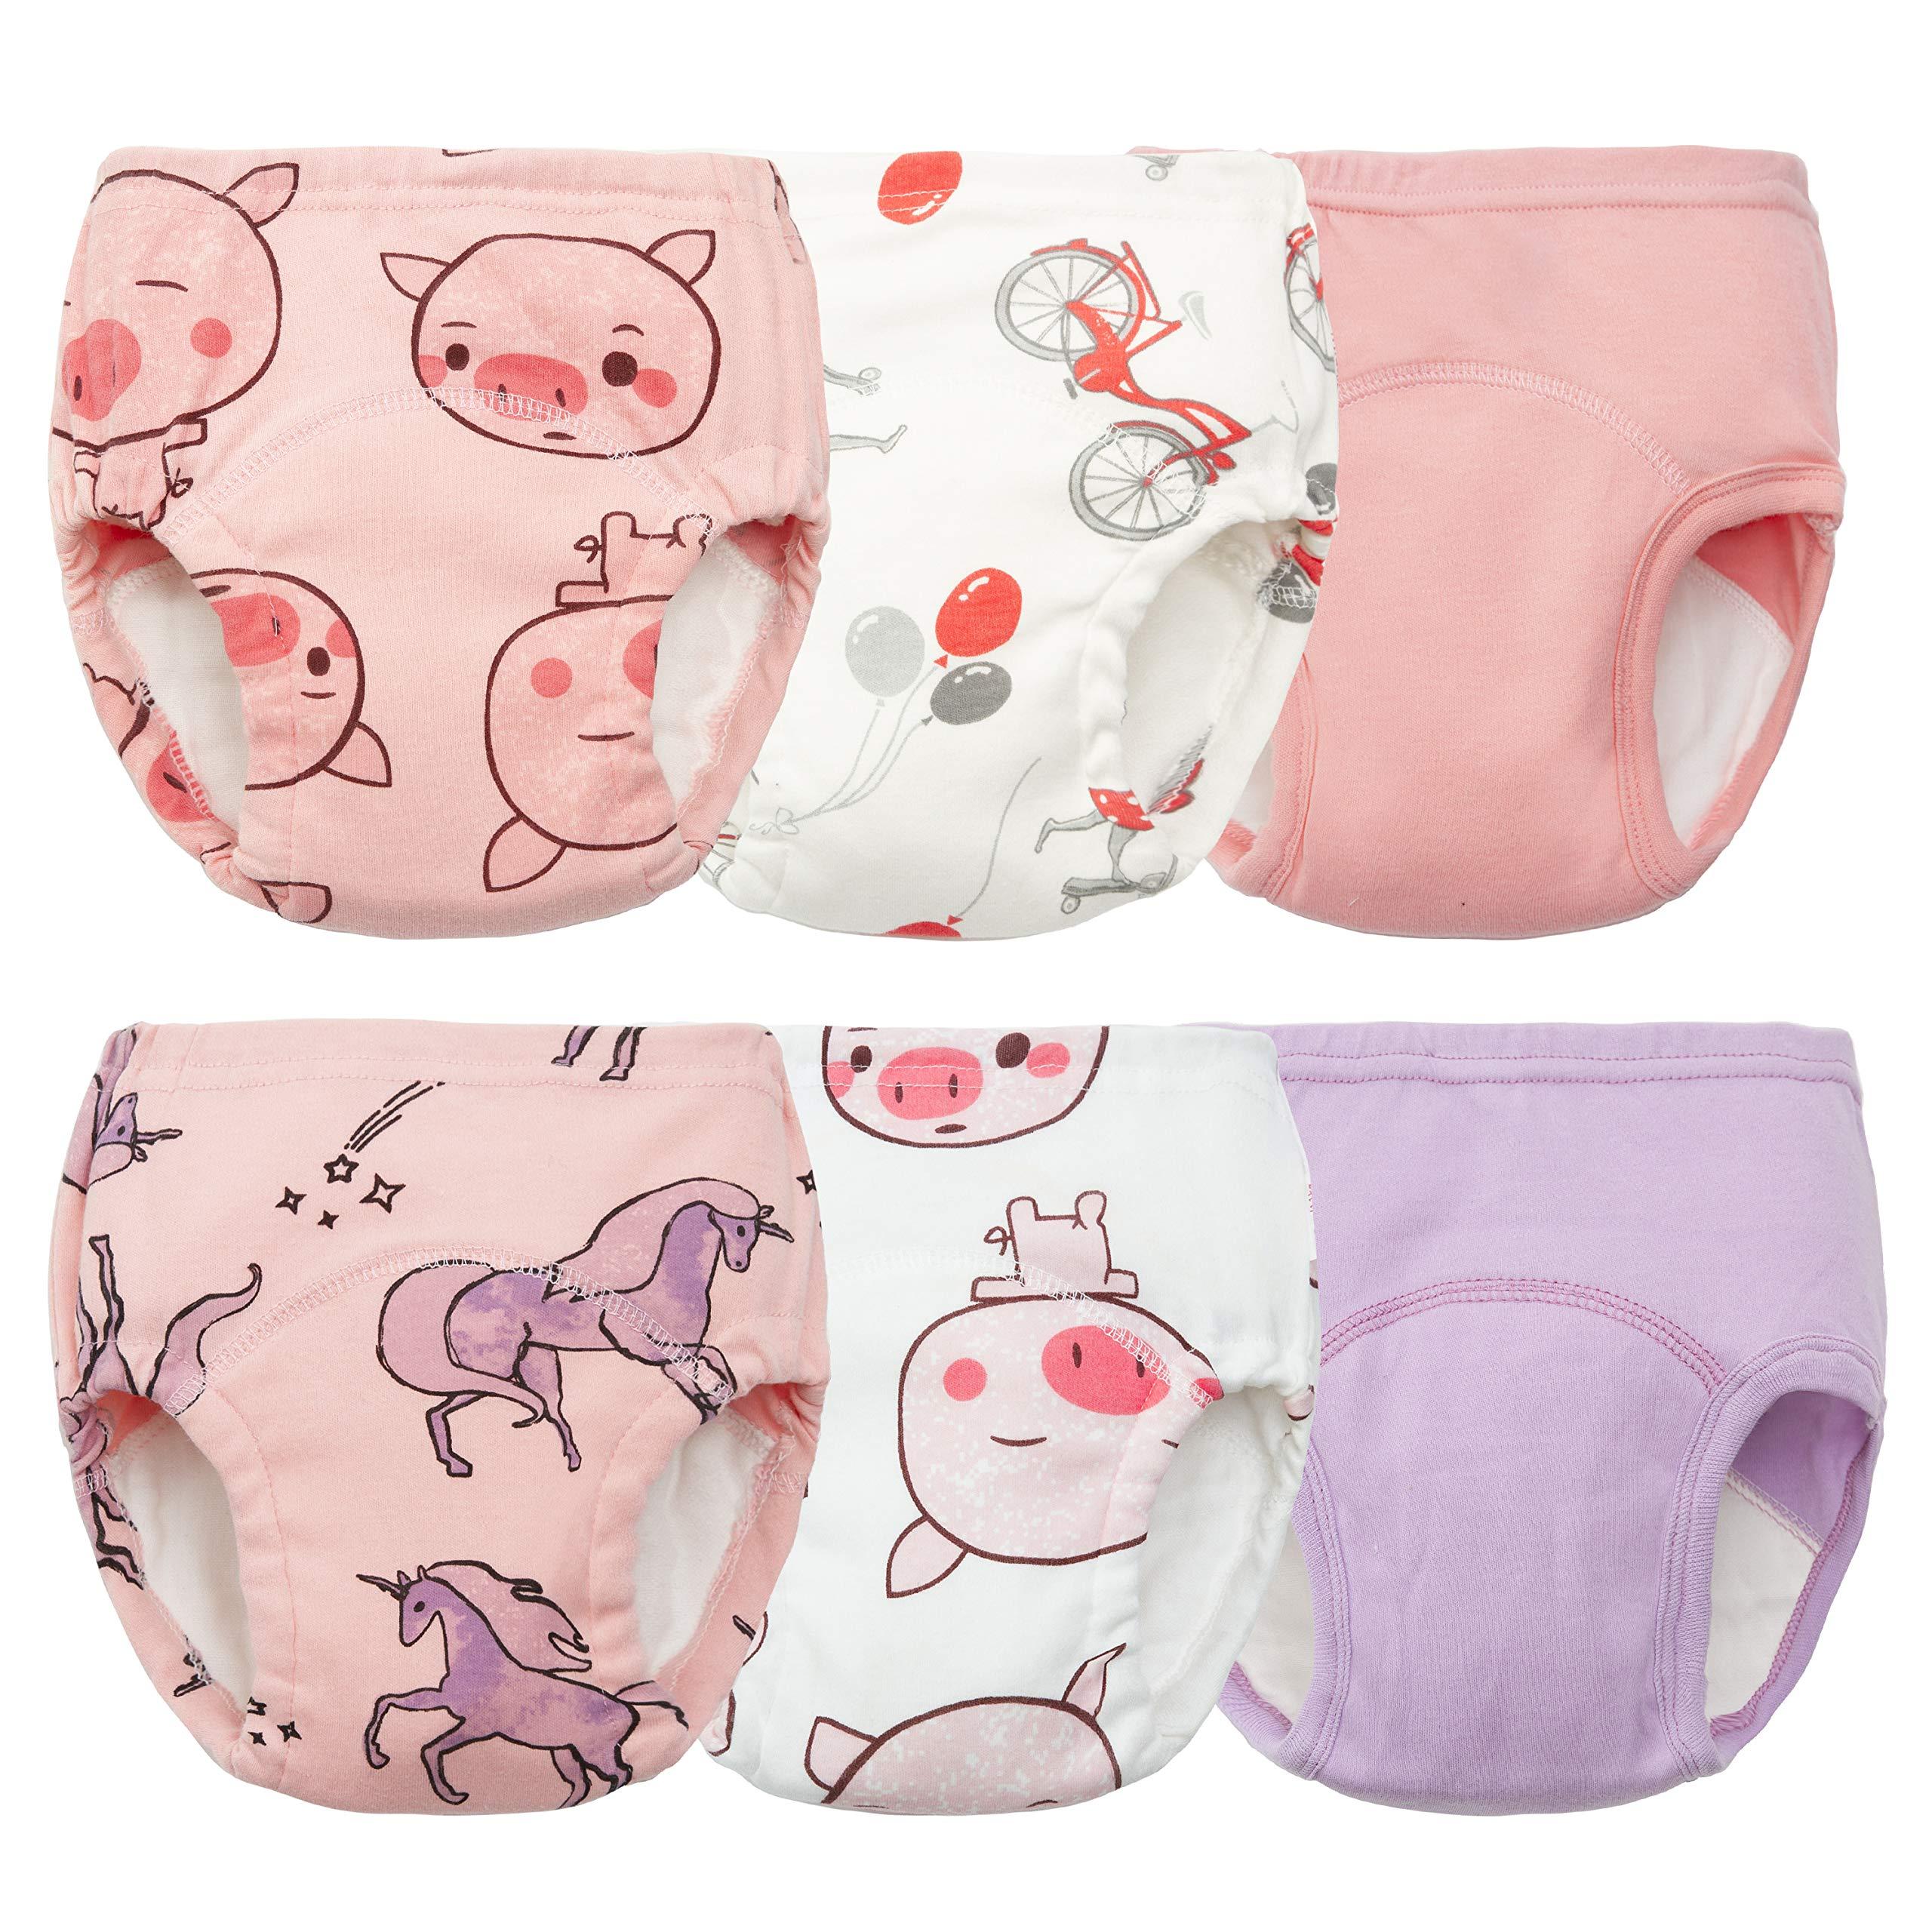 Training Underwear for Girls Toddler Training Underwear Potty Training Underwear Girls 4t-5t Potty Training Pants Girls Potty Training Underwear Waterproof Training Pants for Toddlers